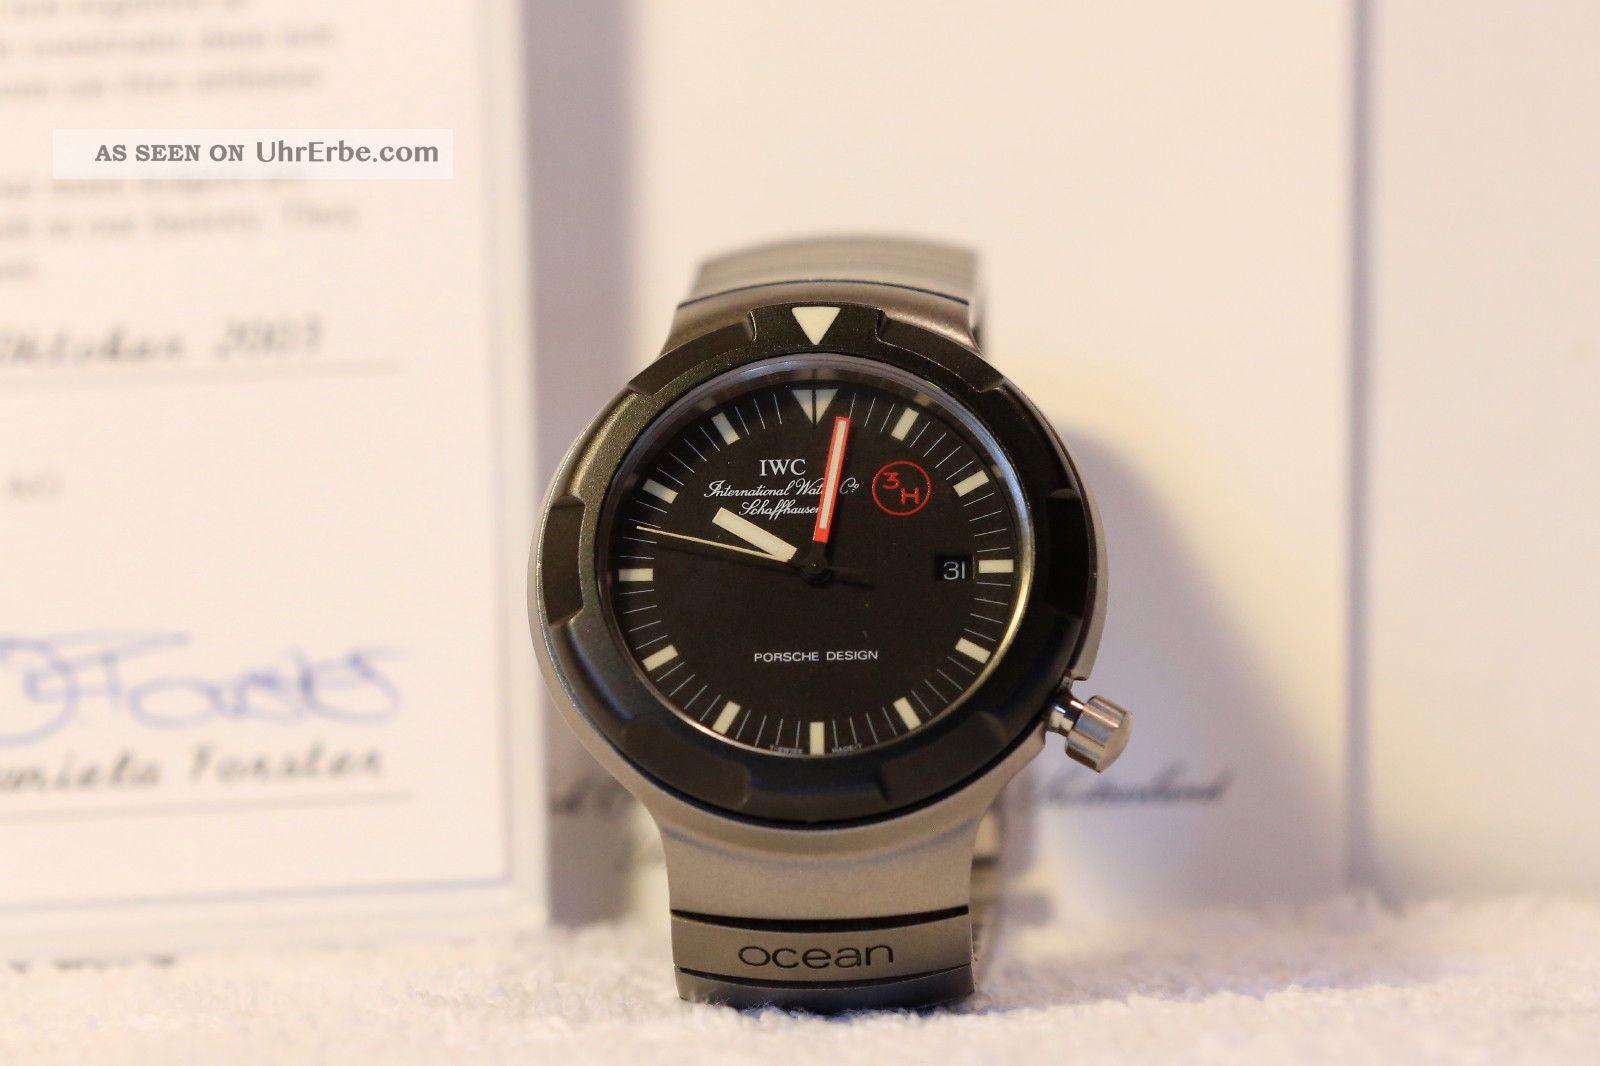 Iwc Ocean Bund Ref.  3314 Kampftaucher Caliber 2250 Box & Certifificate Armbanduhren Bild